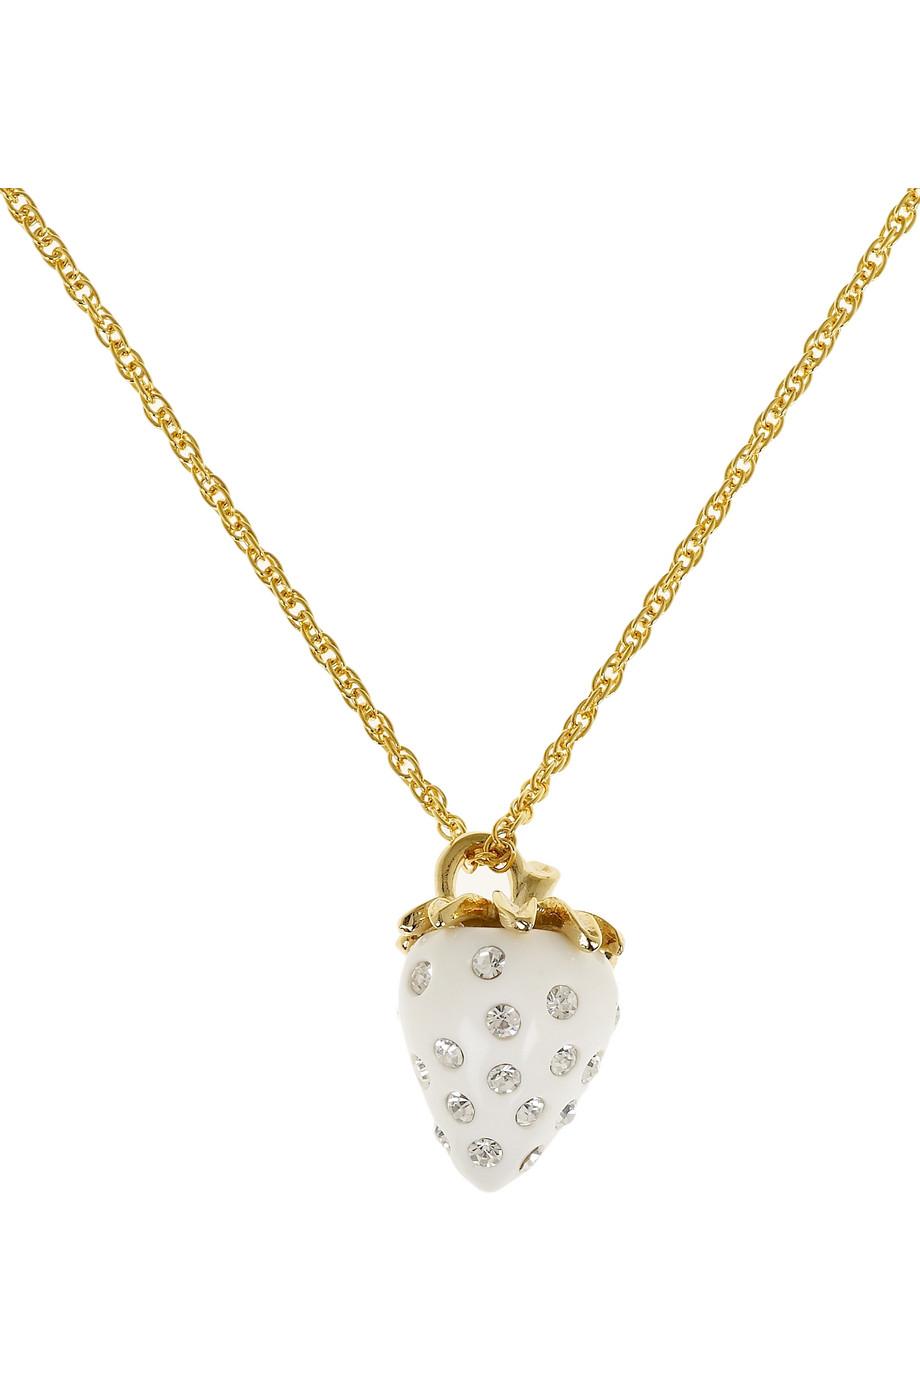 8 Wonderful Kenneth Jay Lane Strawberry Necklace in Jewelry